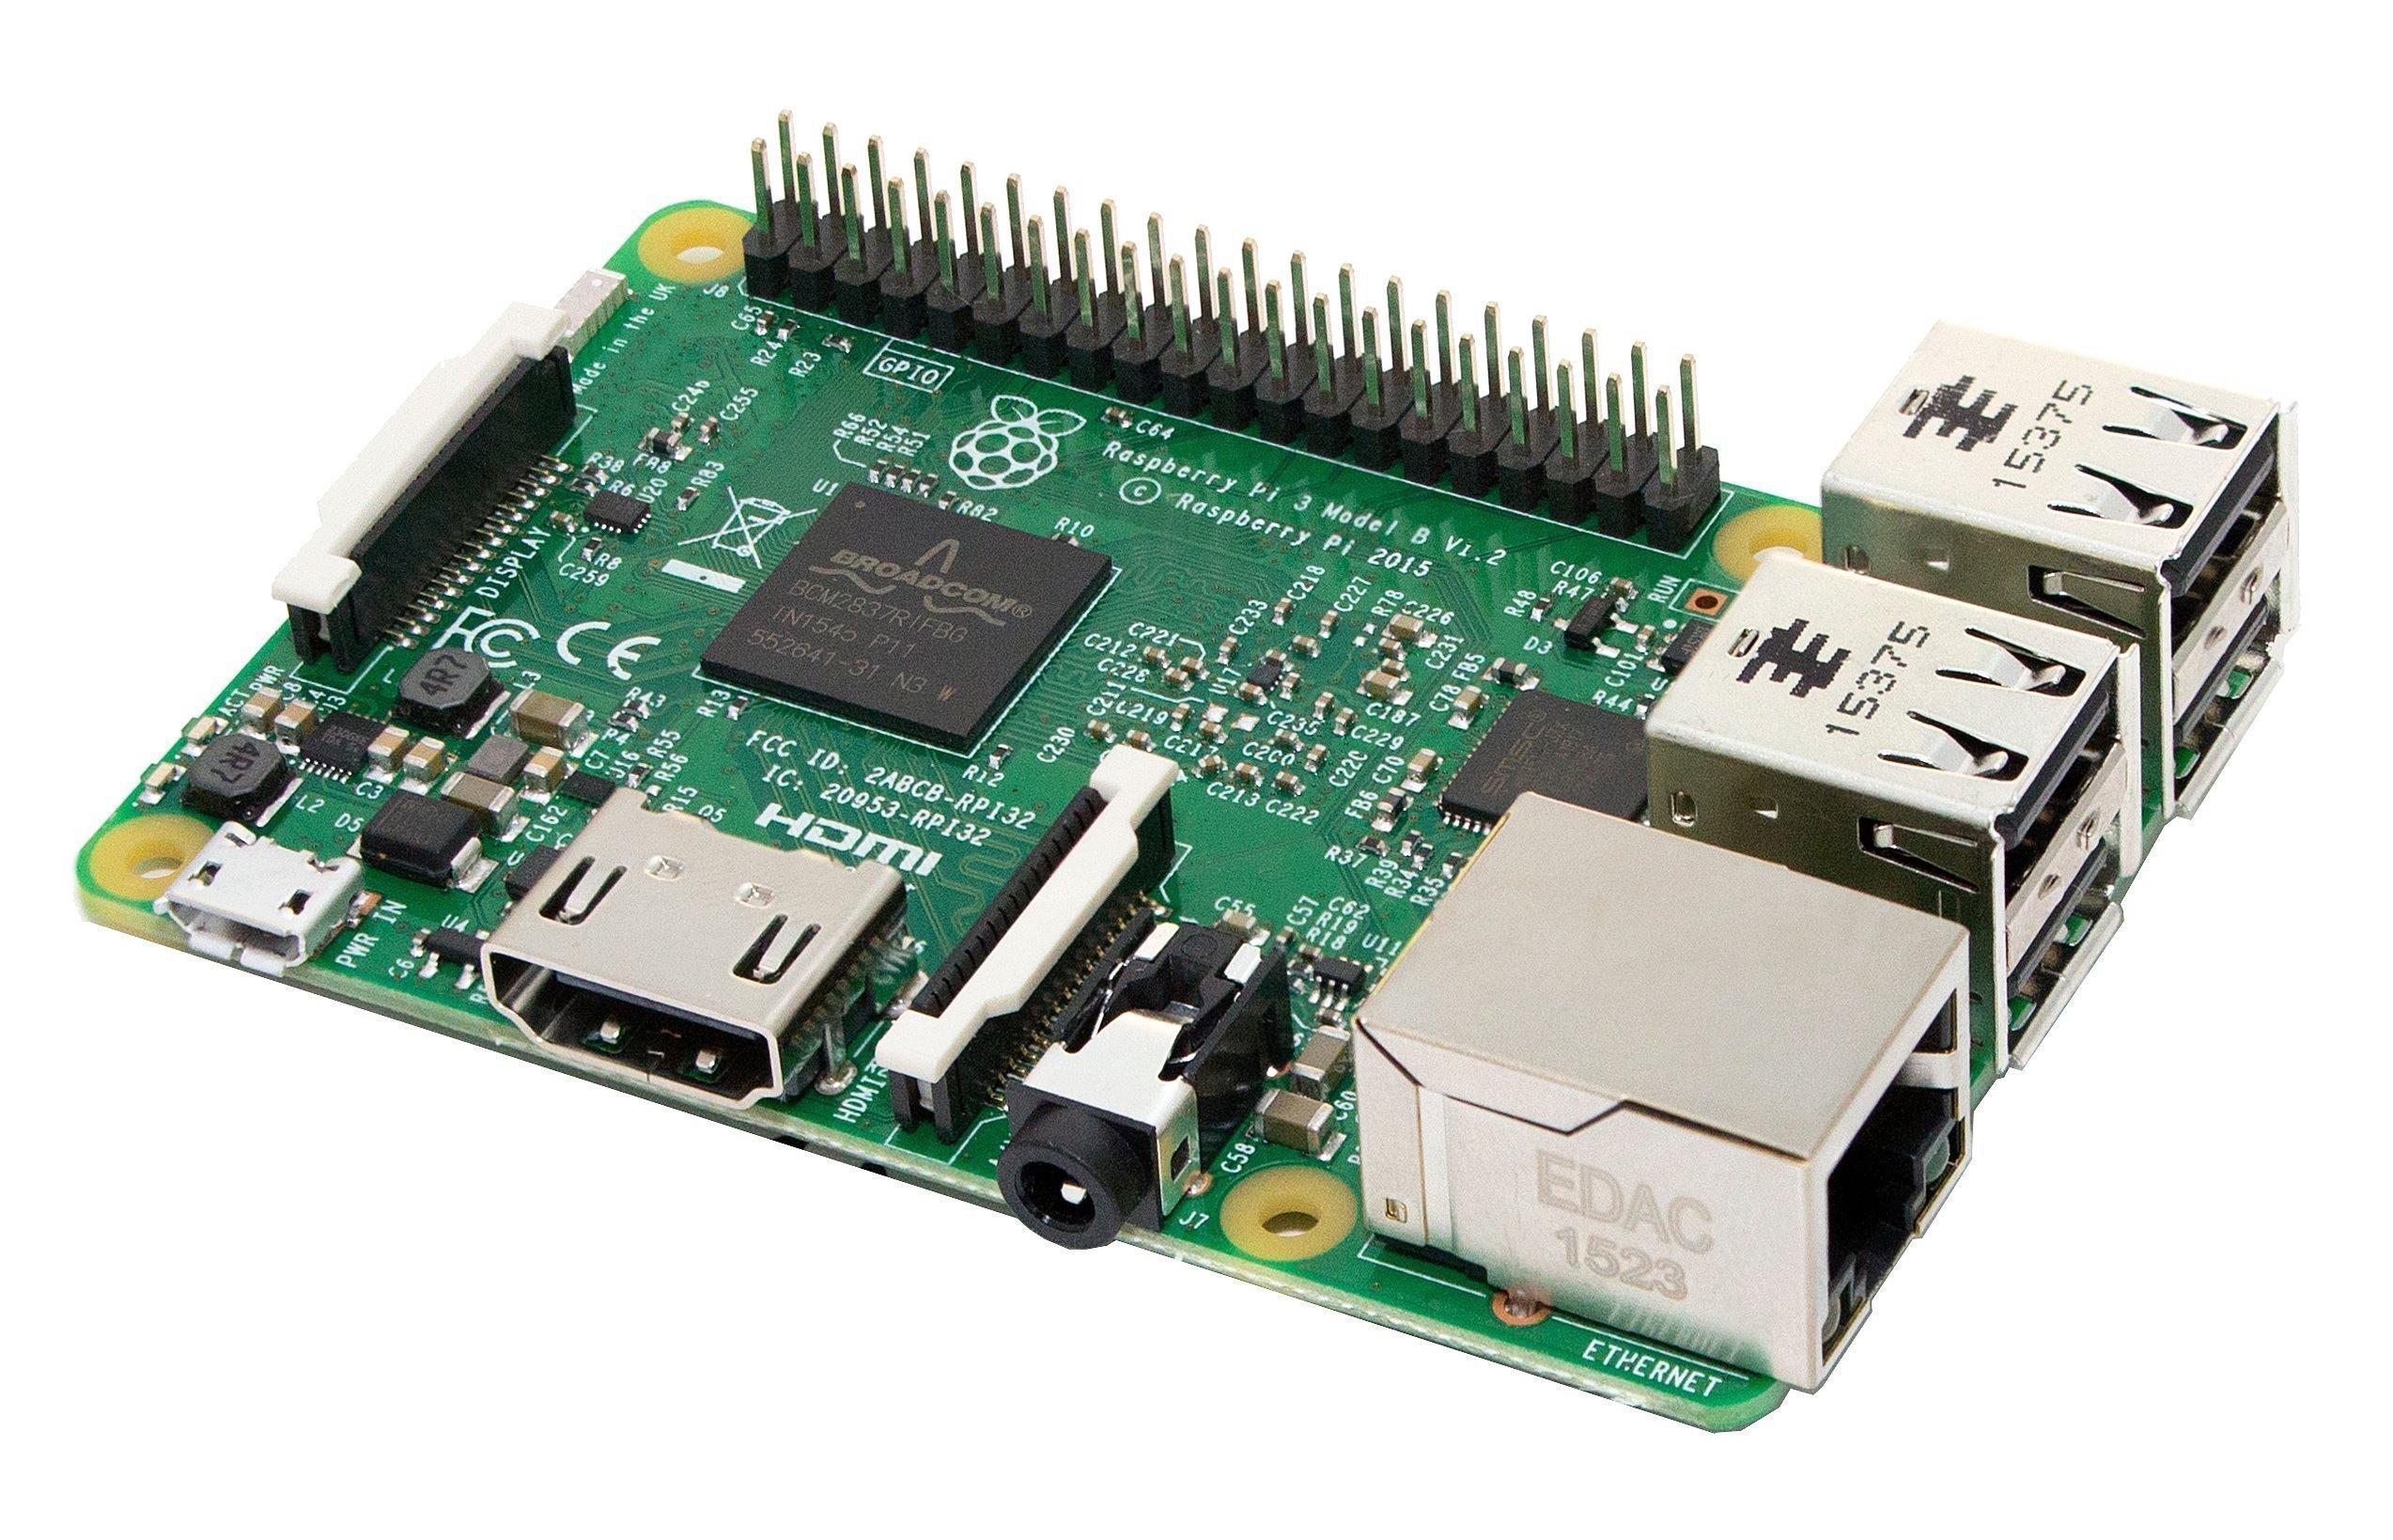 Raspberry Pi Carte Mère 3 Model B Quad Core CPU 1.2 GHz 1 Go RAM product image